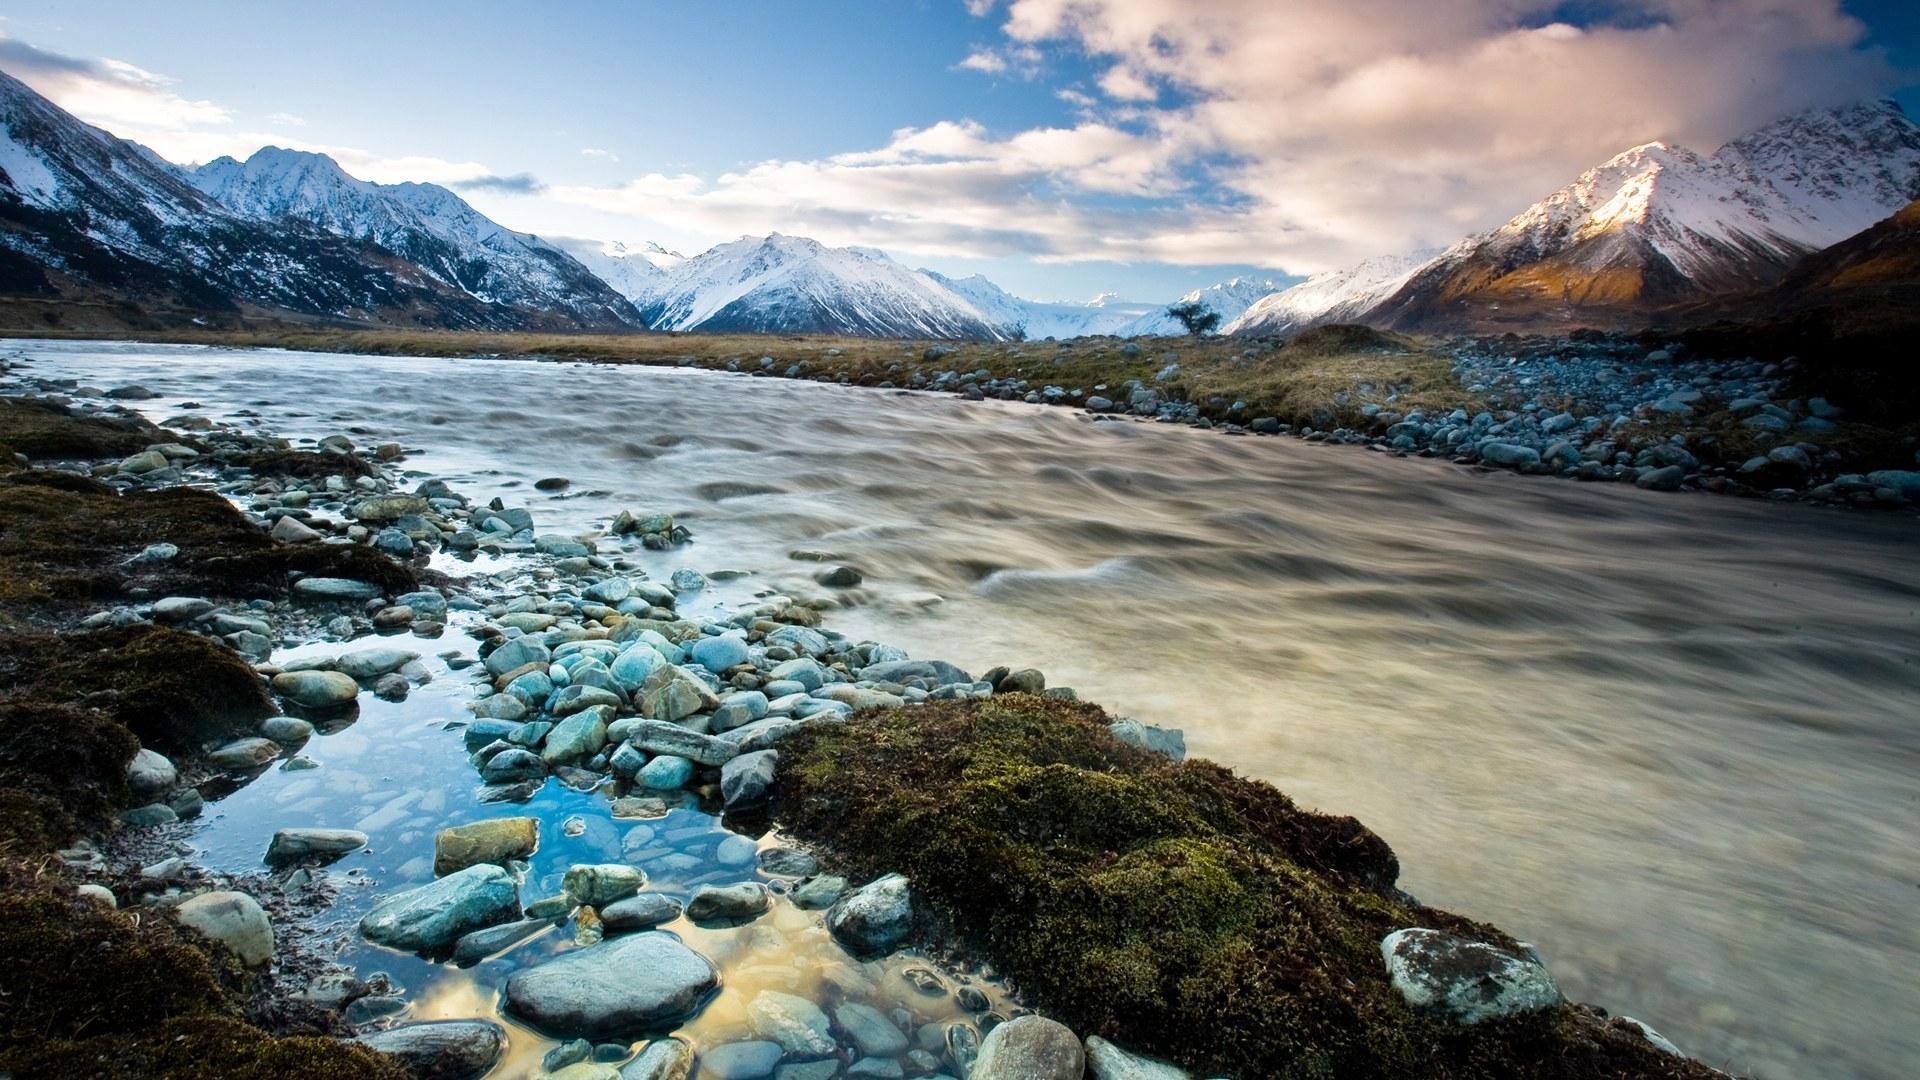 Best-desktop-backgrounds-new-zealand-New-Zealand-Best-for-Best-desktop-bac-wallpaper-wpc9002773